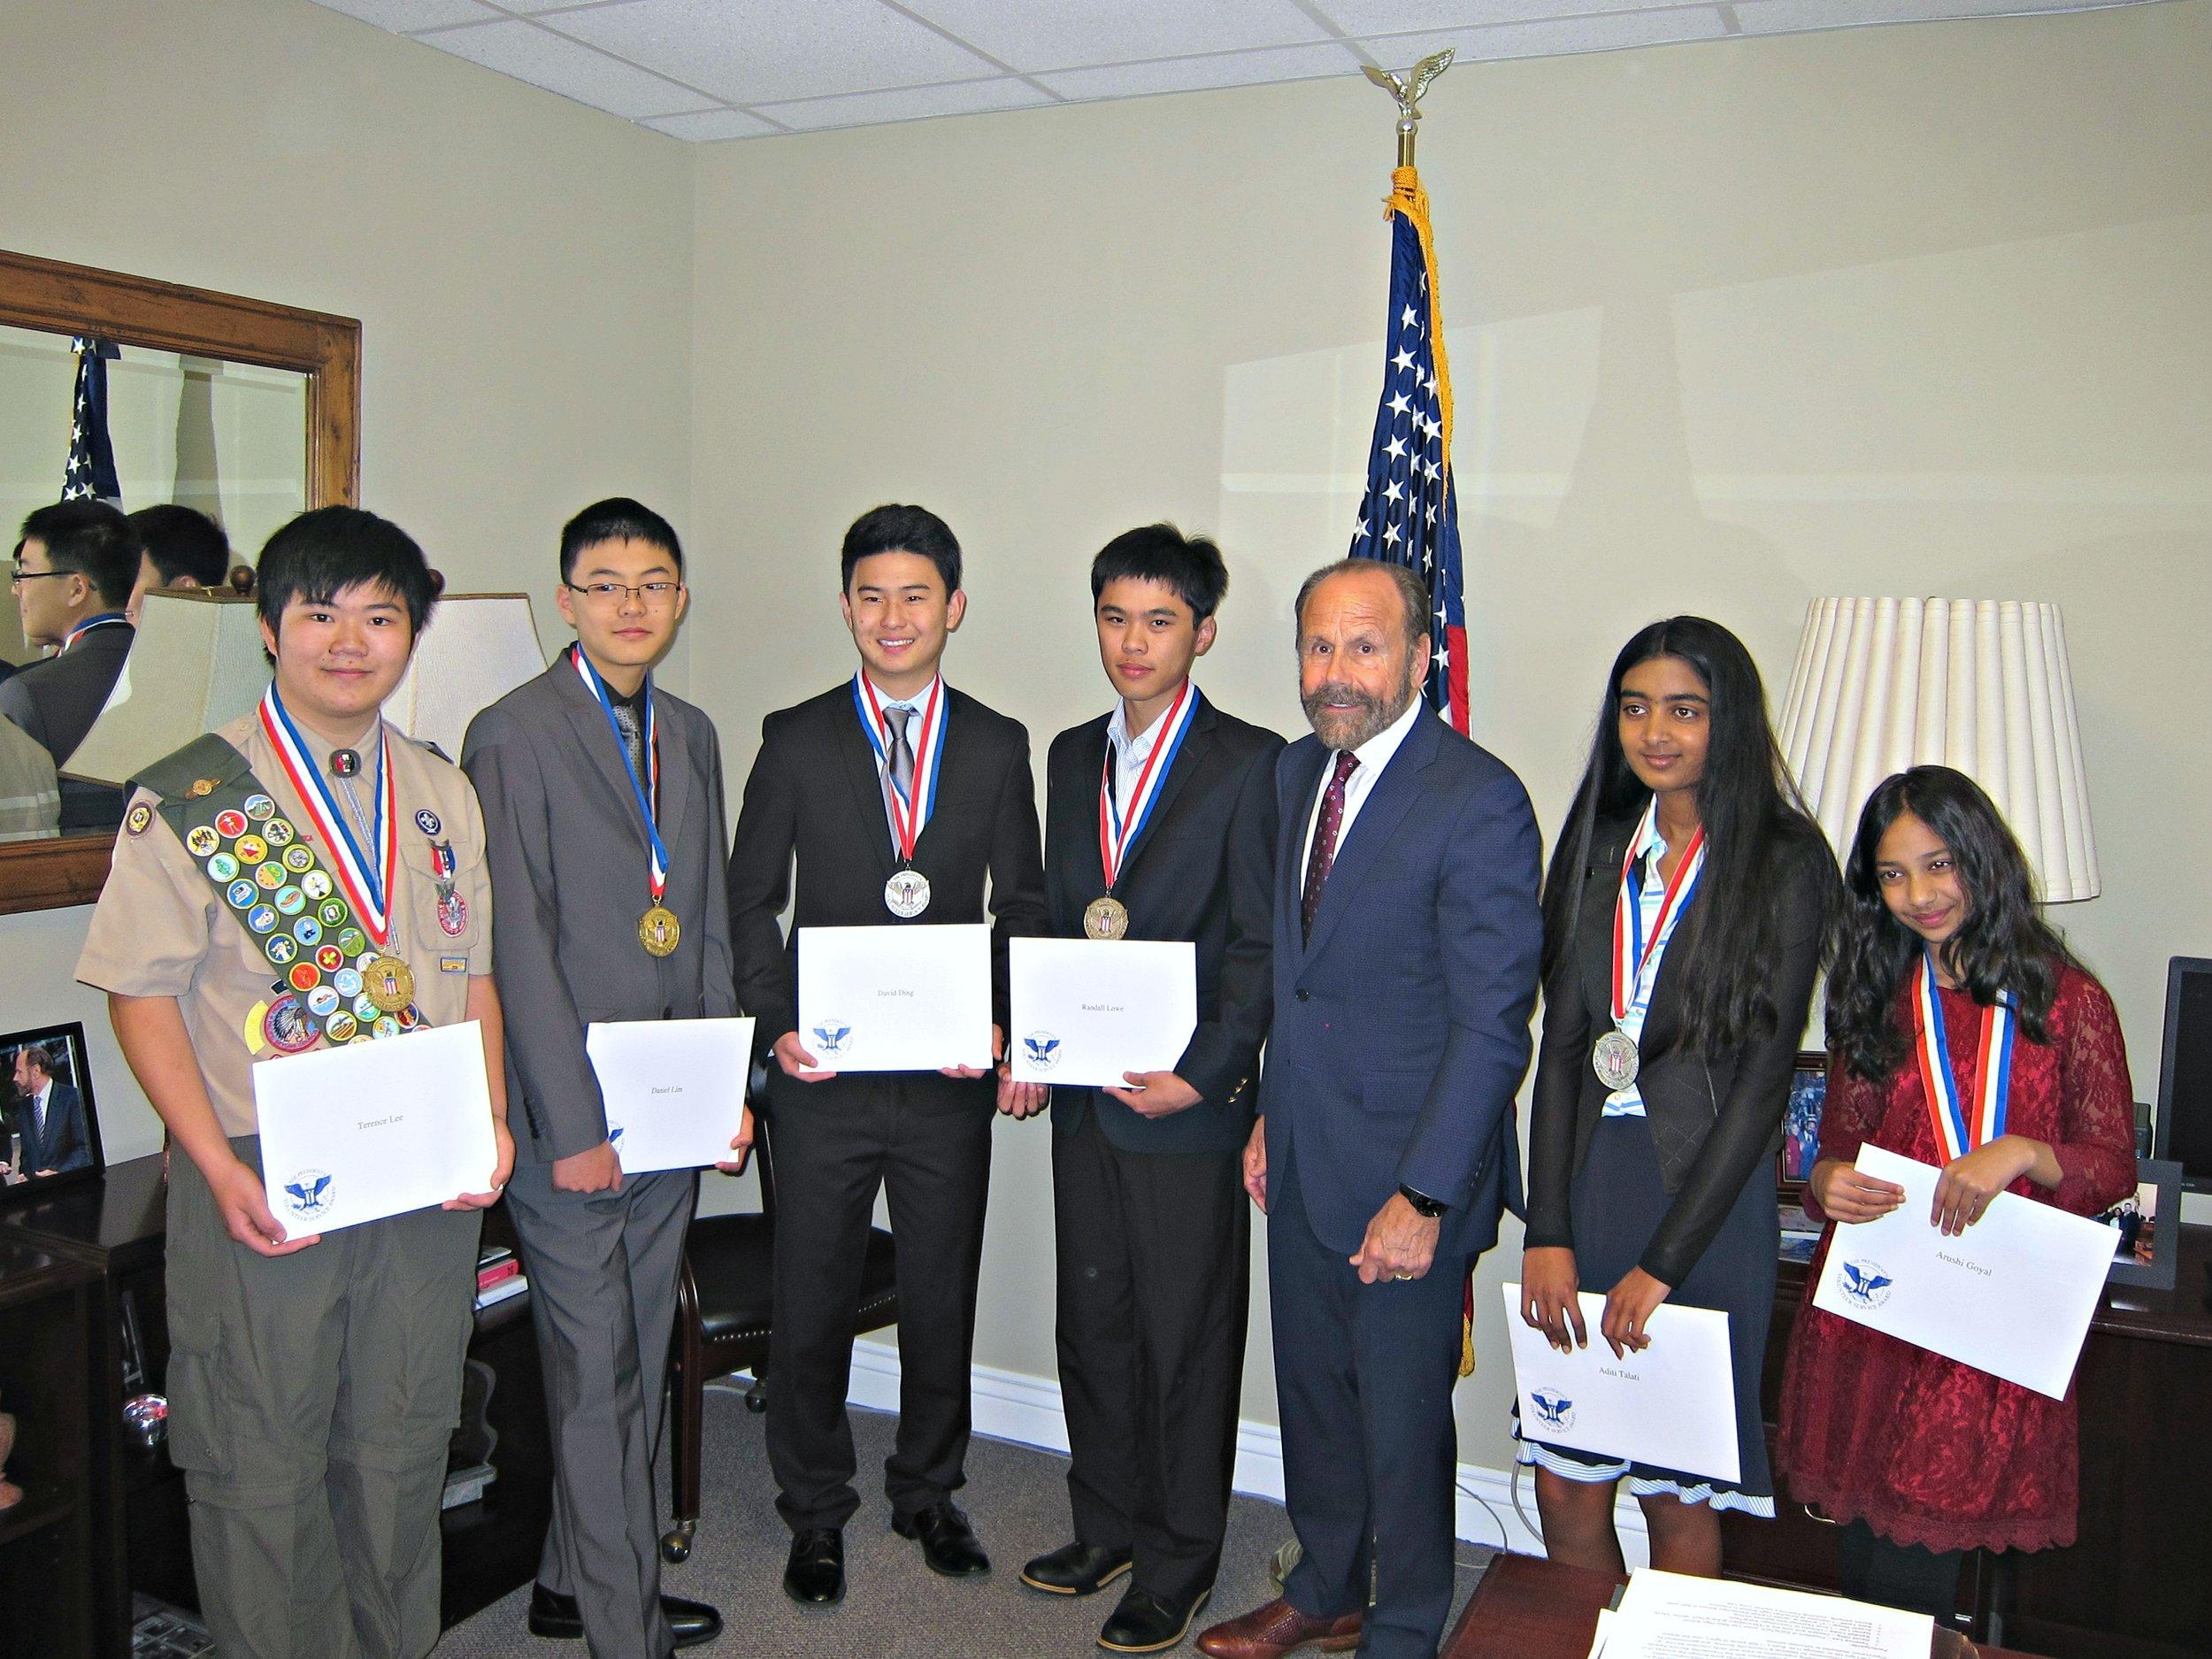 Terence Lee, Daniel Lim, David Ding, Randall Lowe, Senator Jerry Hill, Aditi Talati, Arushi Goyal (left to right)